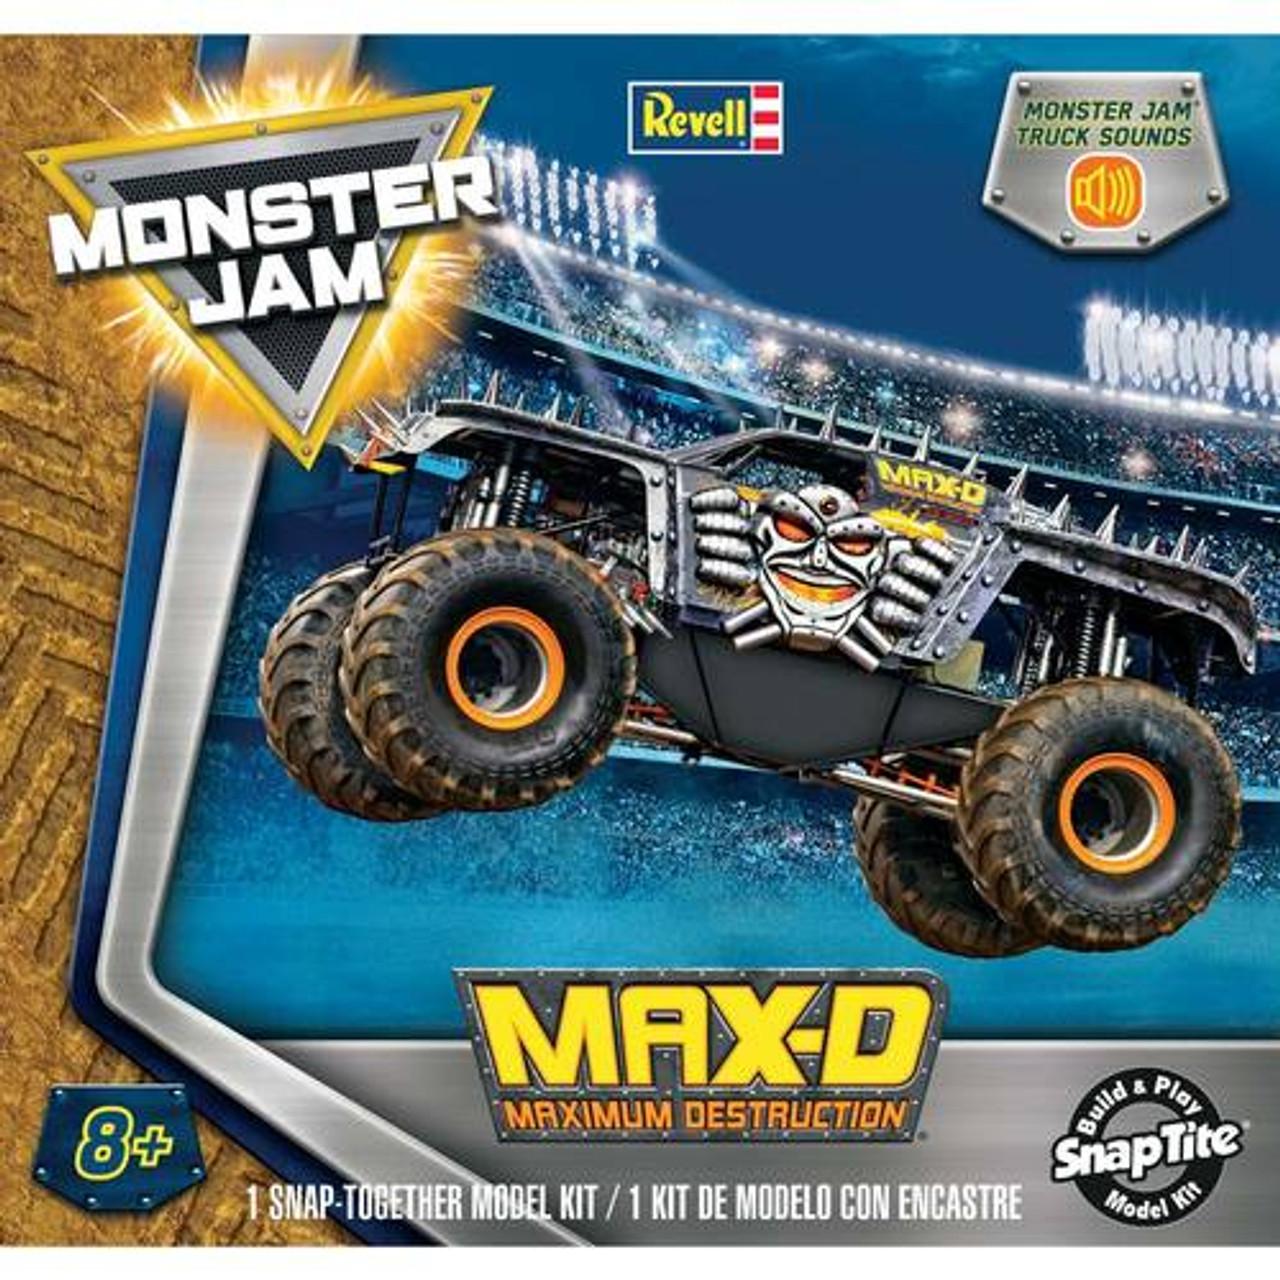 RMX851989  Max-d Monster Truck Skill 2